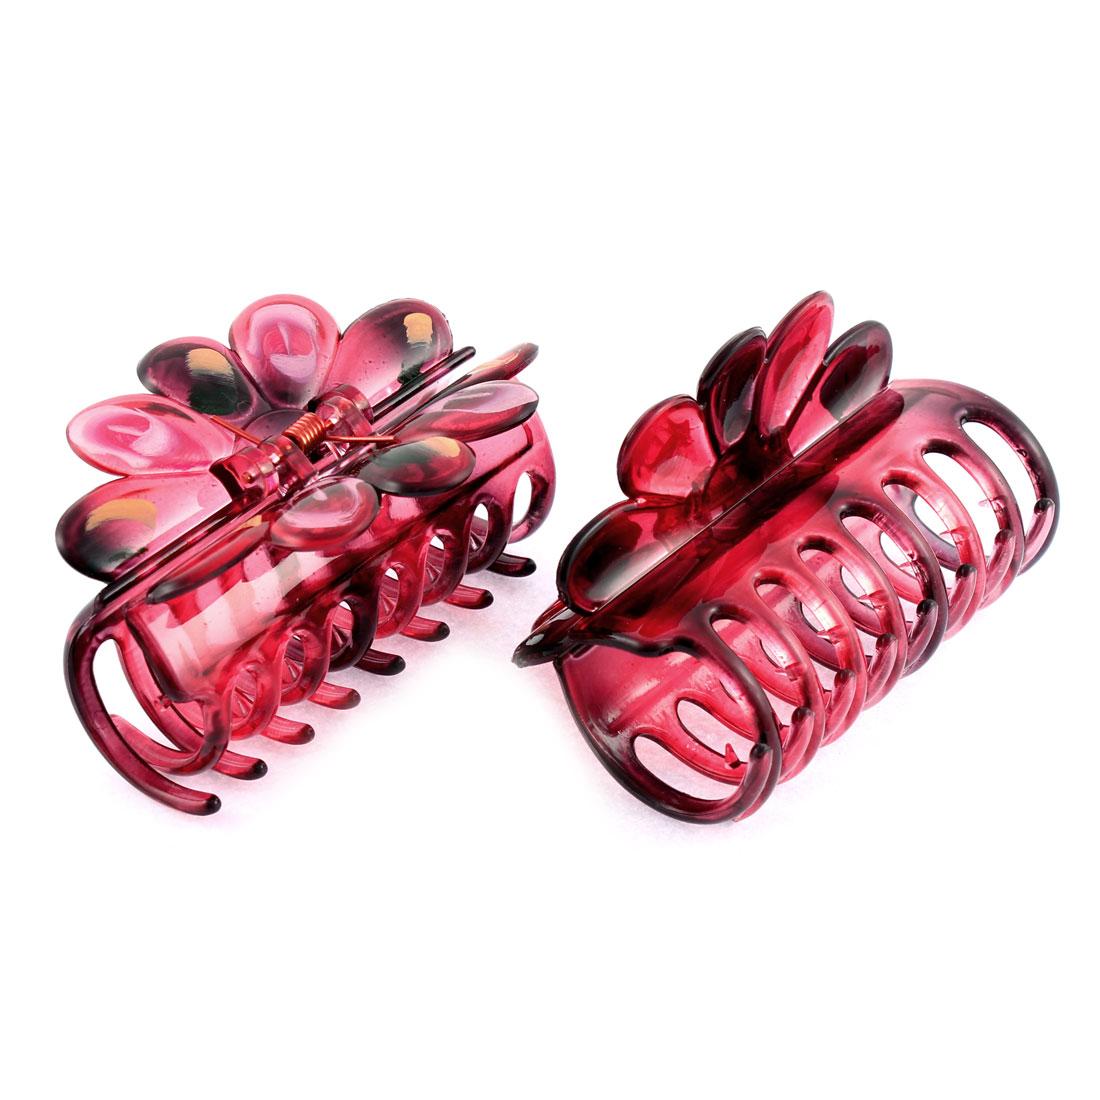 2 Pcs Plastic Spring Loaded Hair Claw Clip Barrette Decoration Burgundy